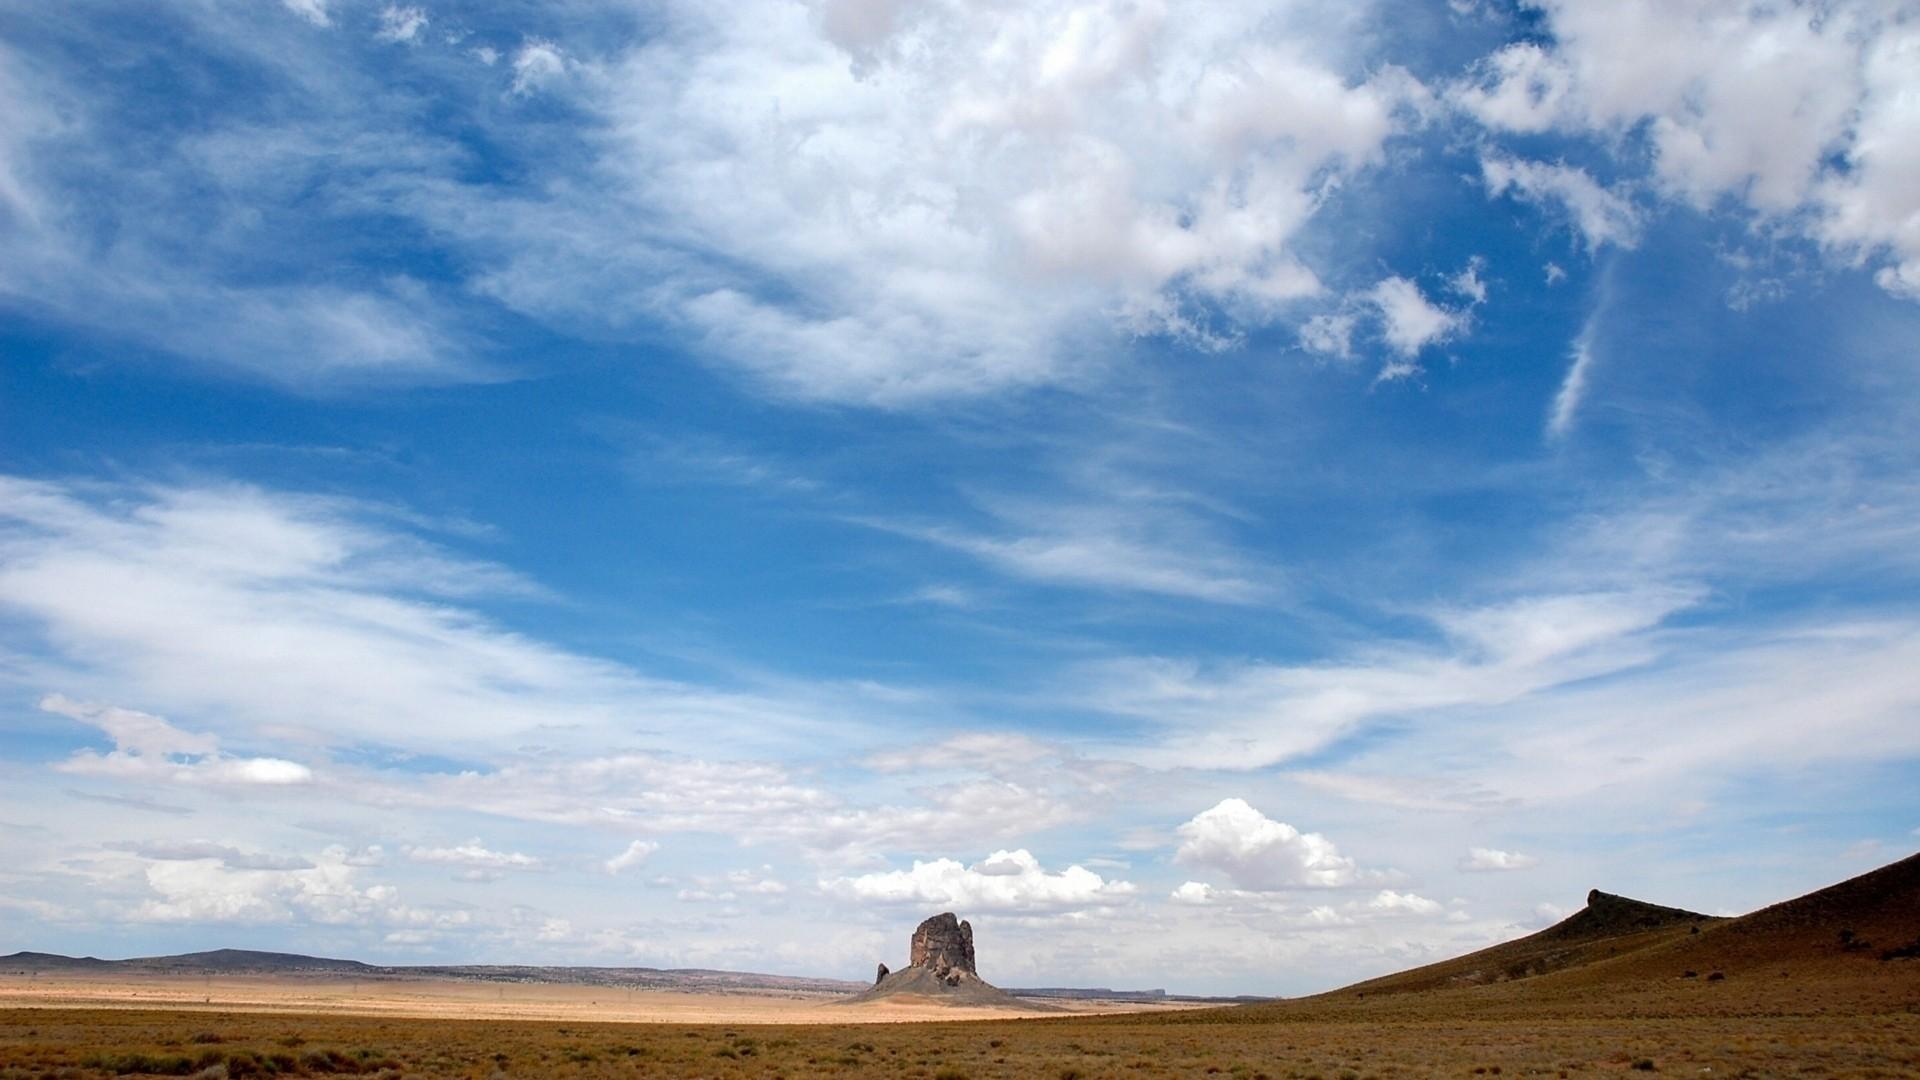 Wallpaper sky, clouds, blue, easy, air, desert, canyon,